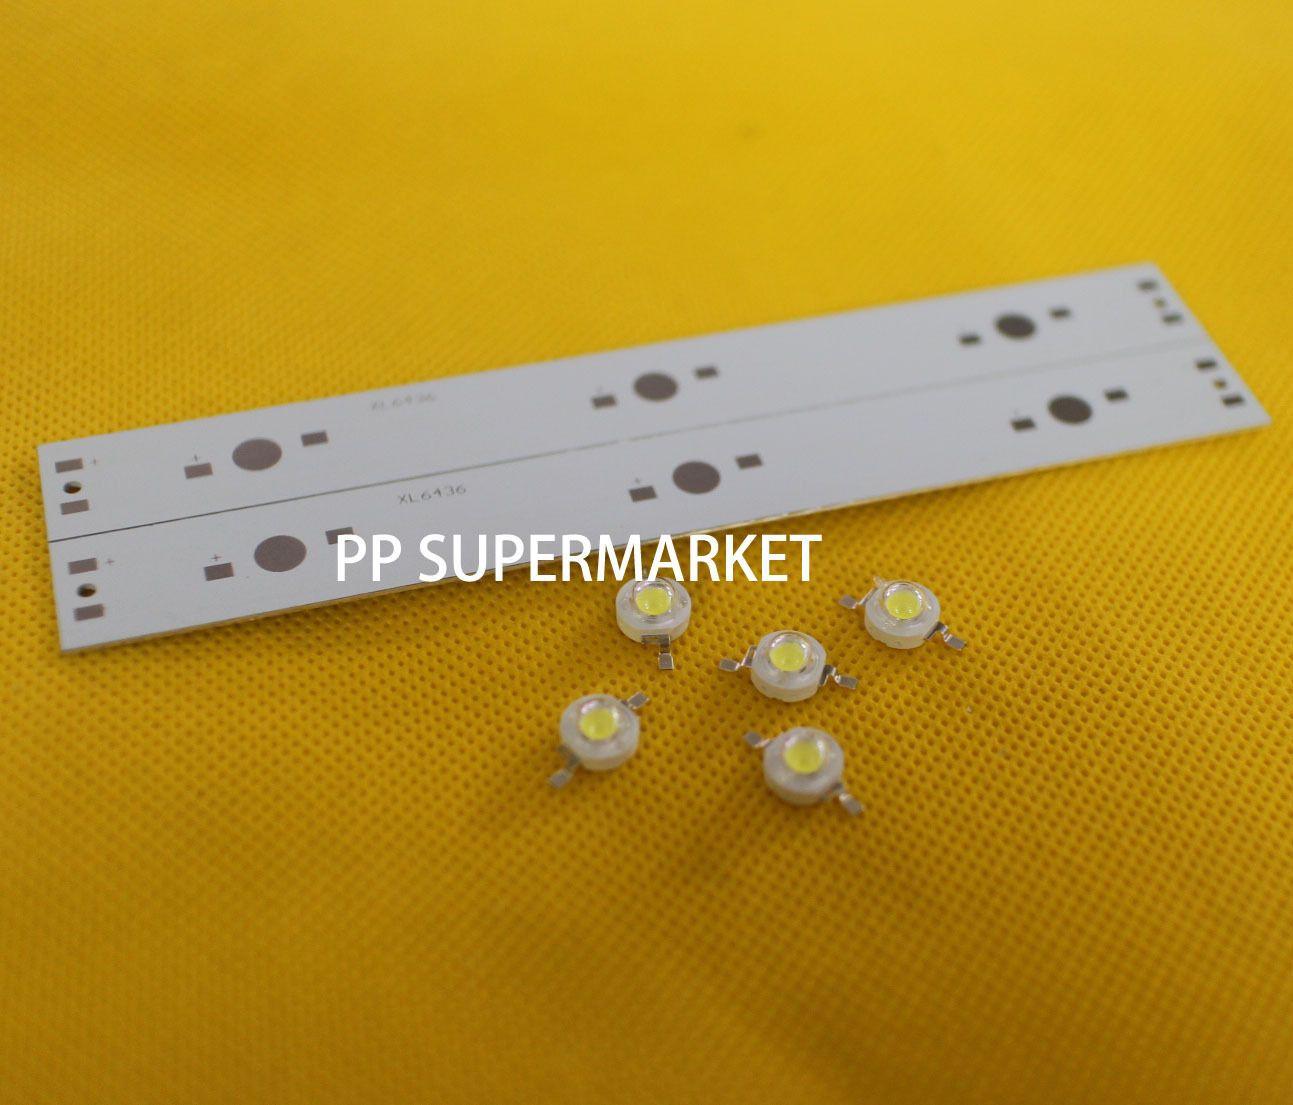 123 2pcs 140mm X 16mm Aluminium Pcb Circuit Board For 3 1w3w Led Series 1w 3w 5w In 1w3w5w Ebay Home Garden